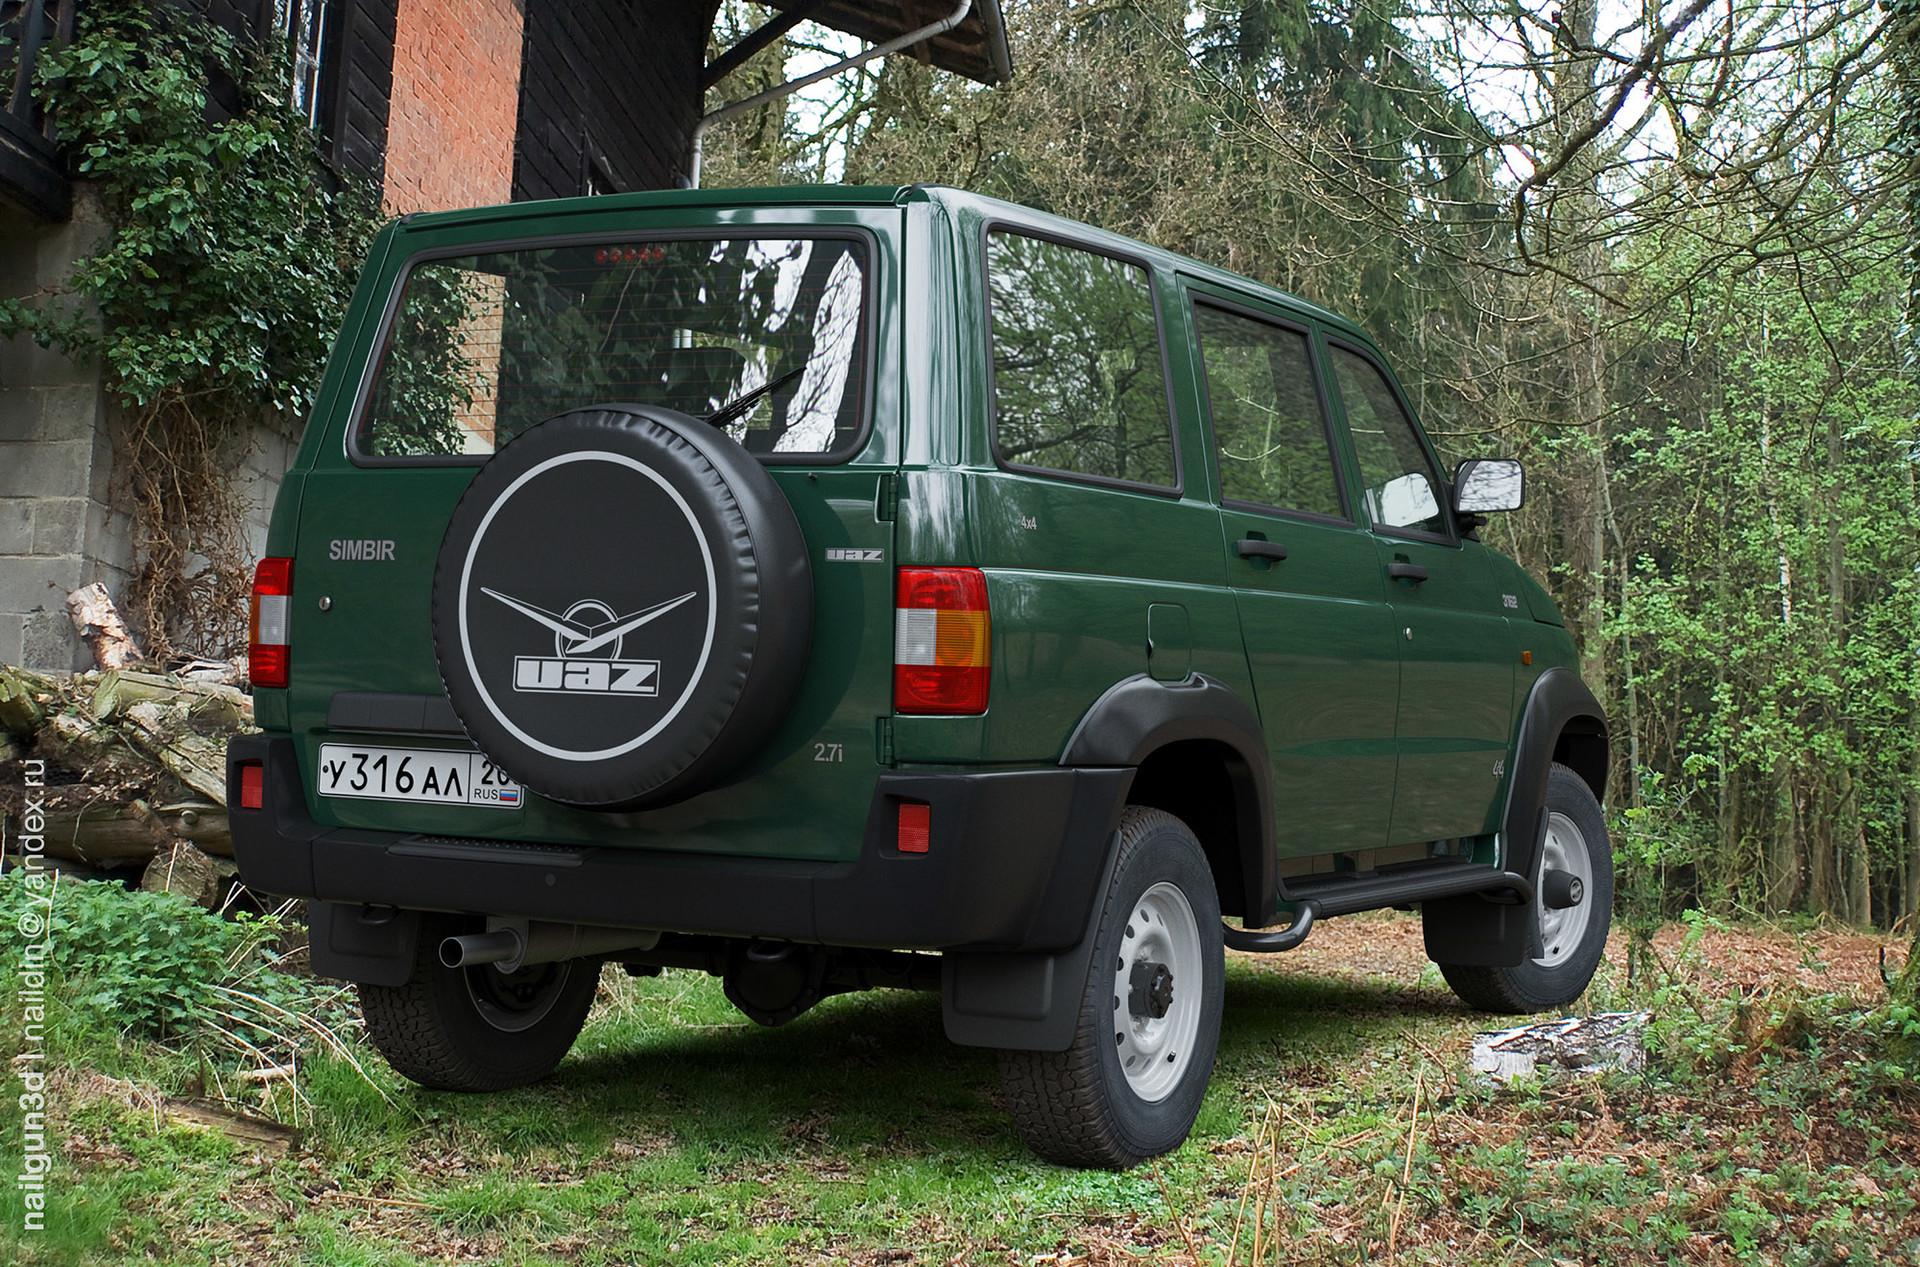 Nail khusnutdinov als 224 010 uaz 3162 simbir rear view 3x